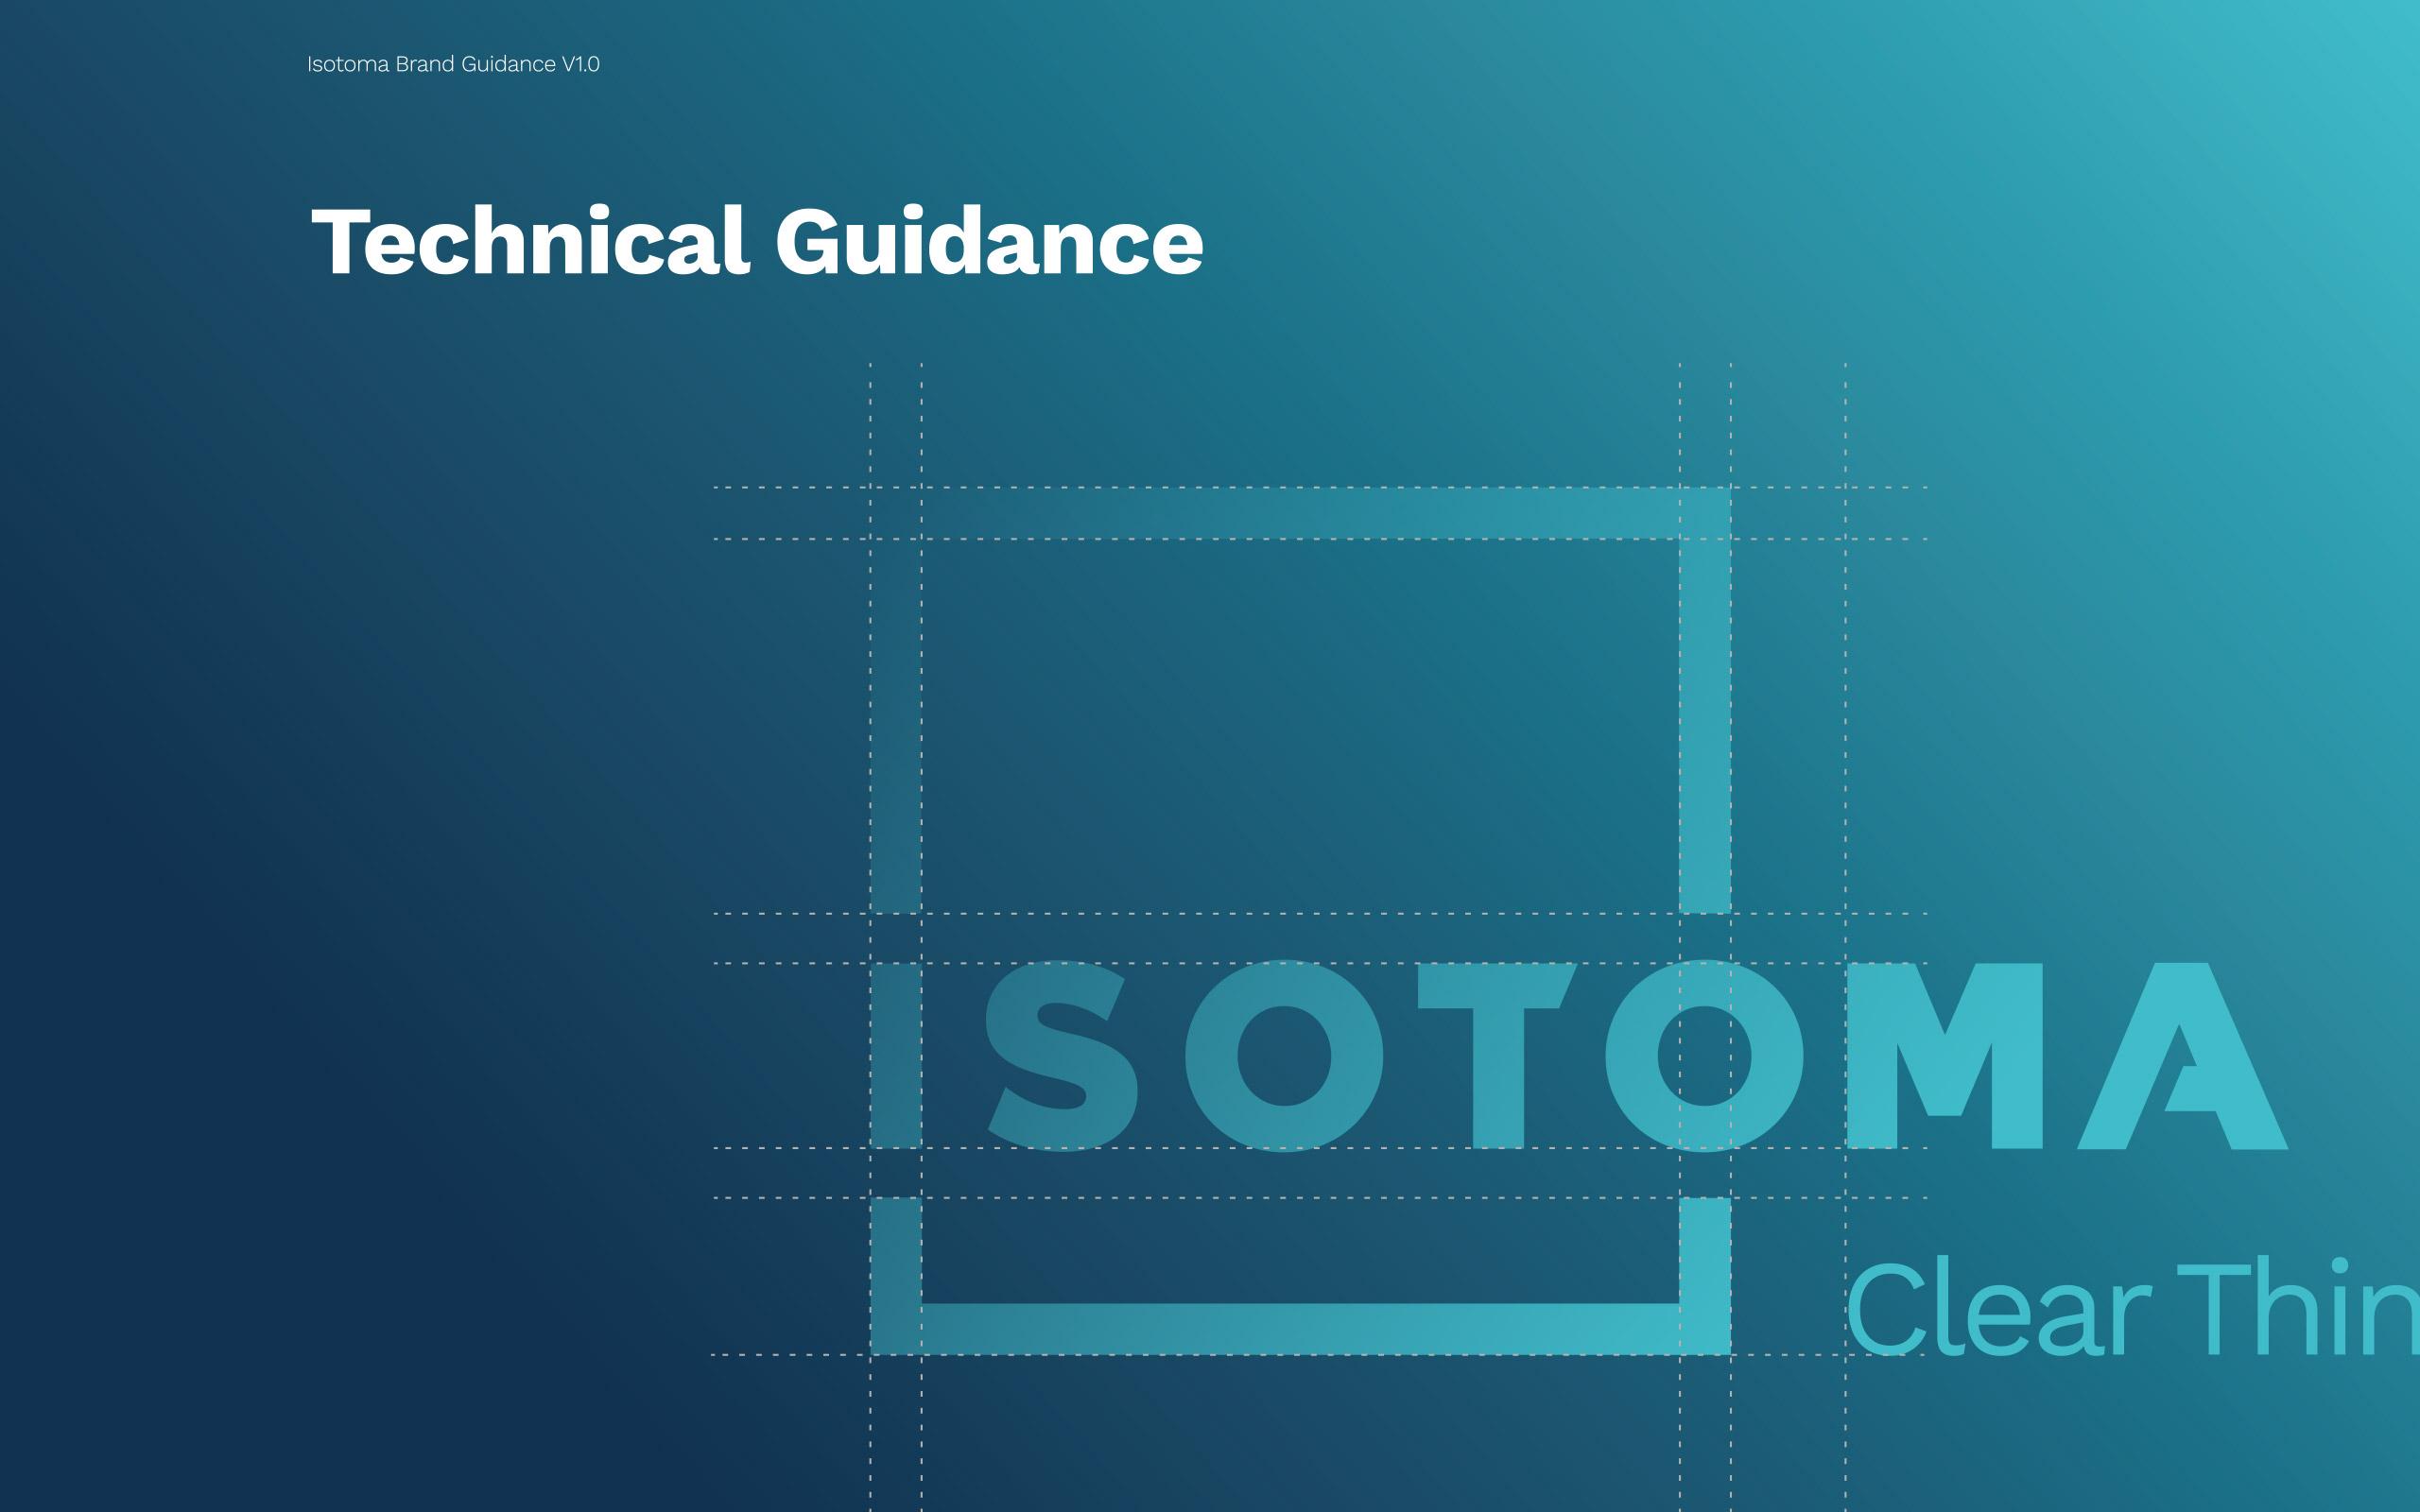 Isotoma logo guidance